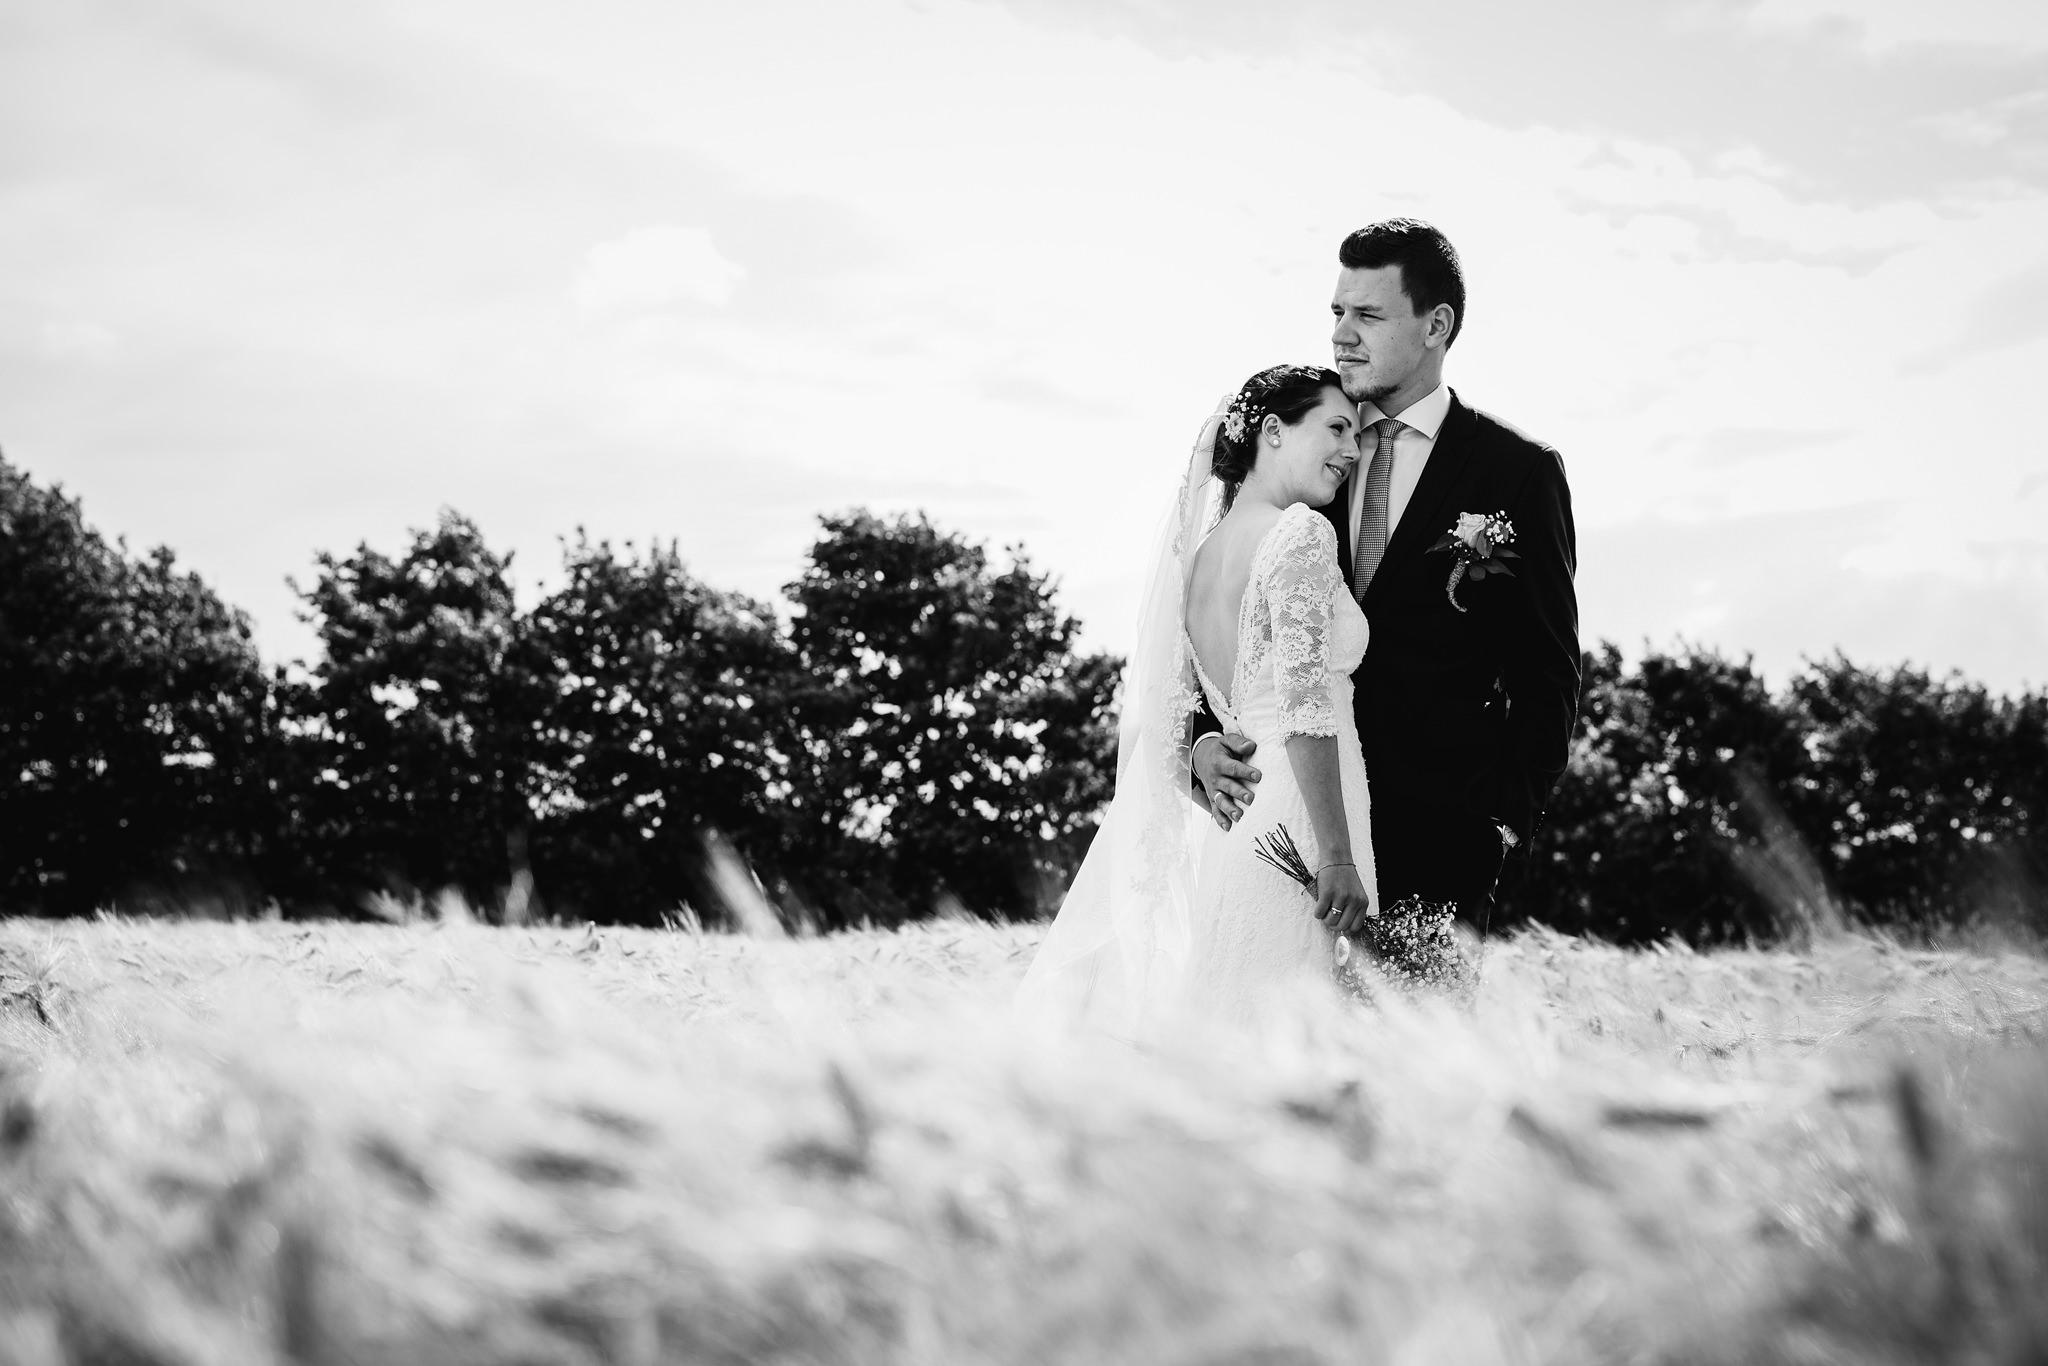 Norway+wedding+photographer+elopement+pre+wedding+Casey+Arneson-85.jpg